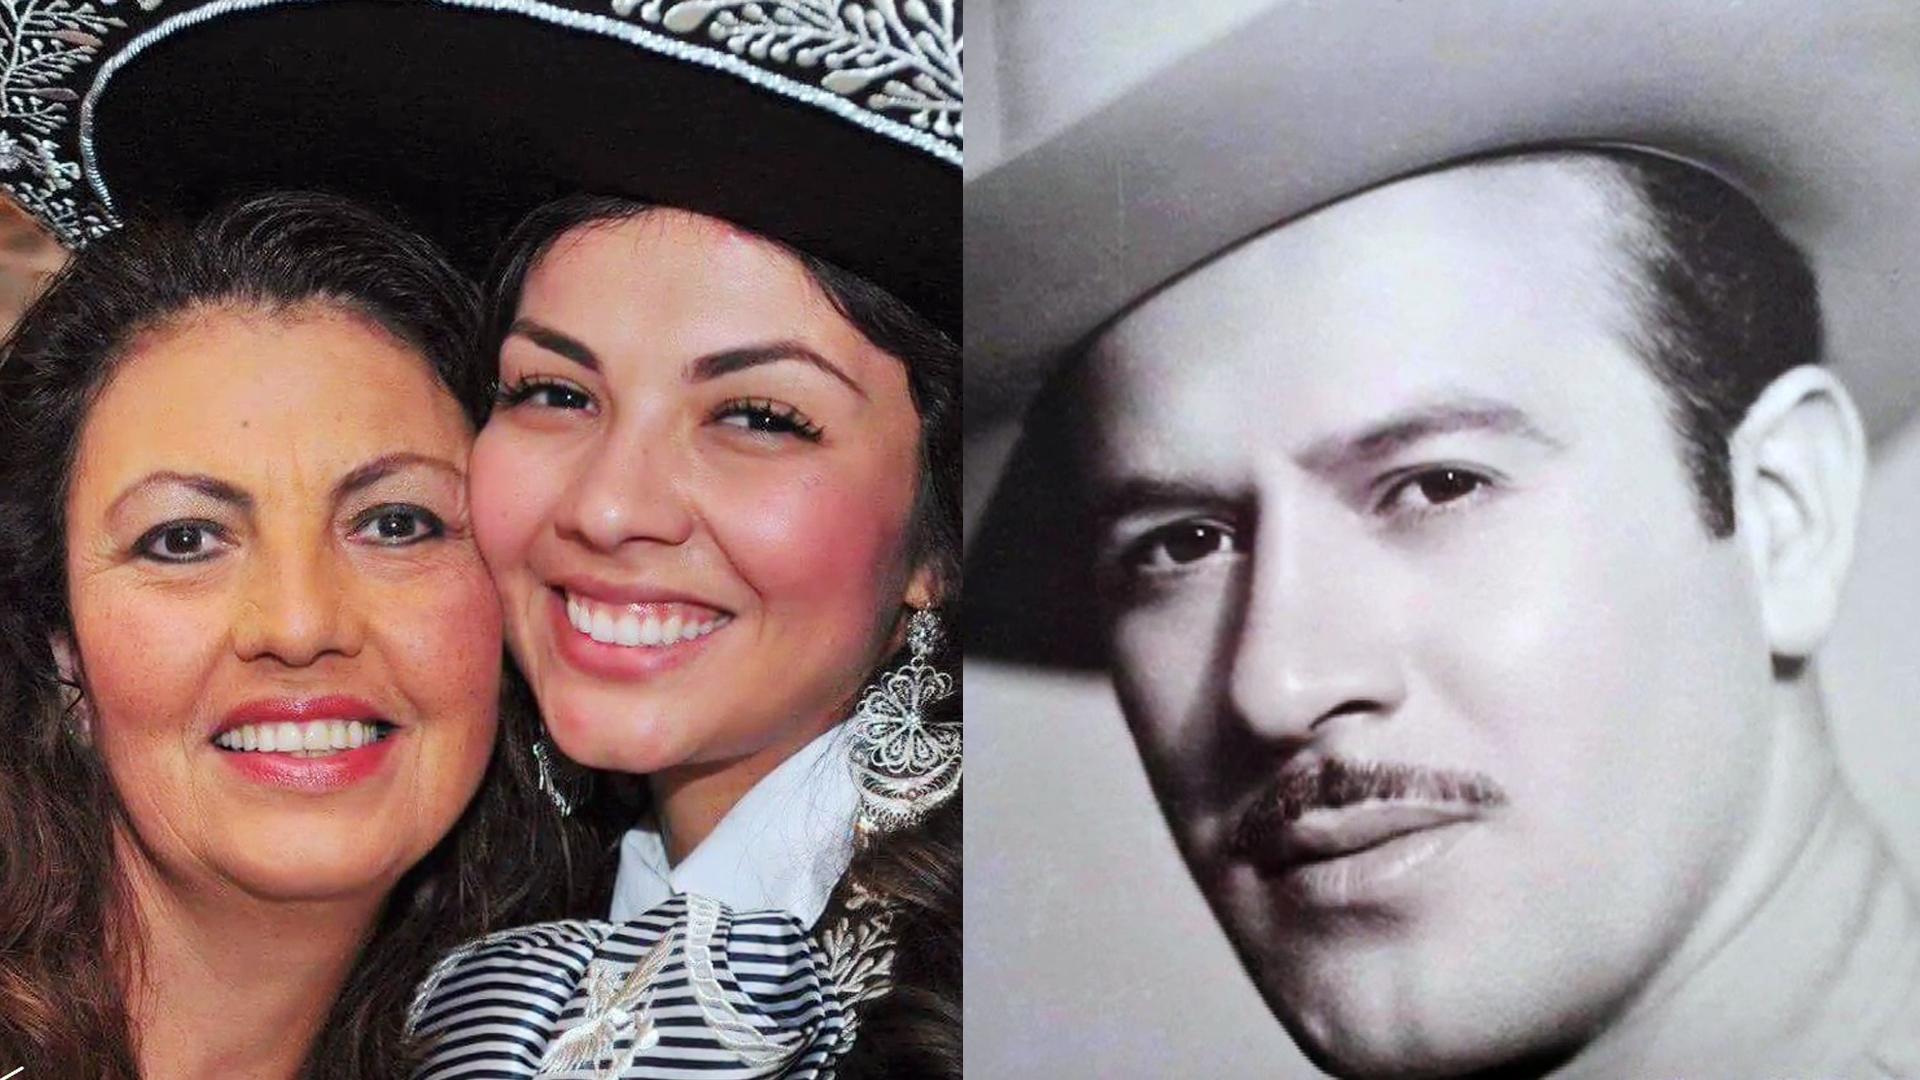 Gente que nos inspira: La nieta de Pedro Infante comparte